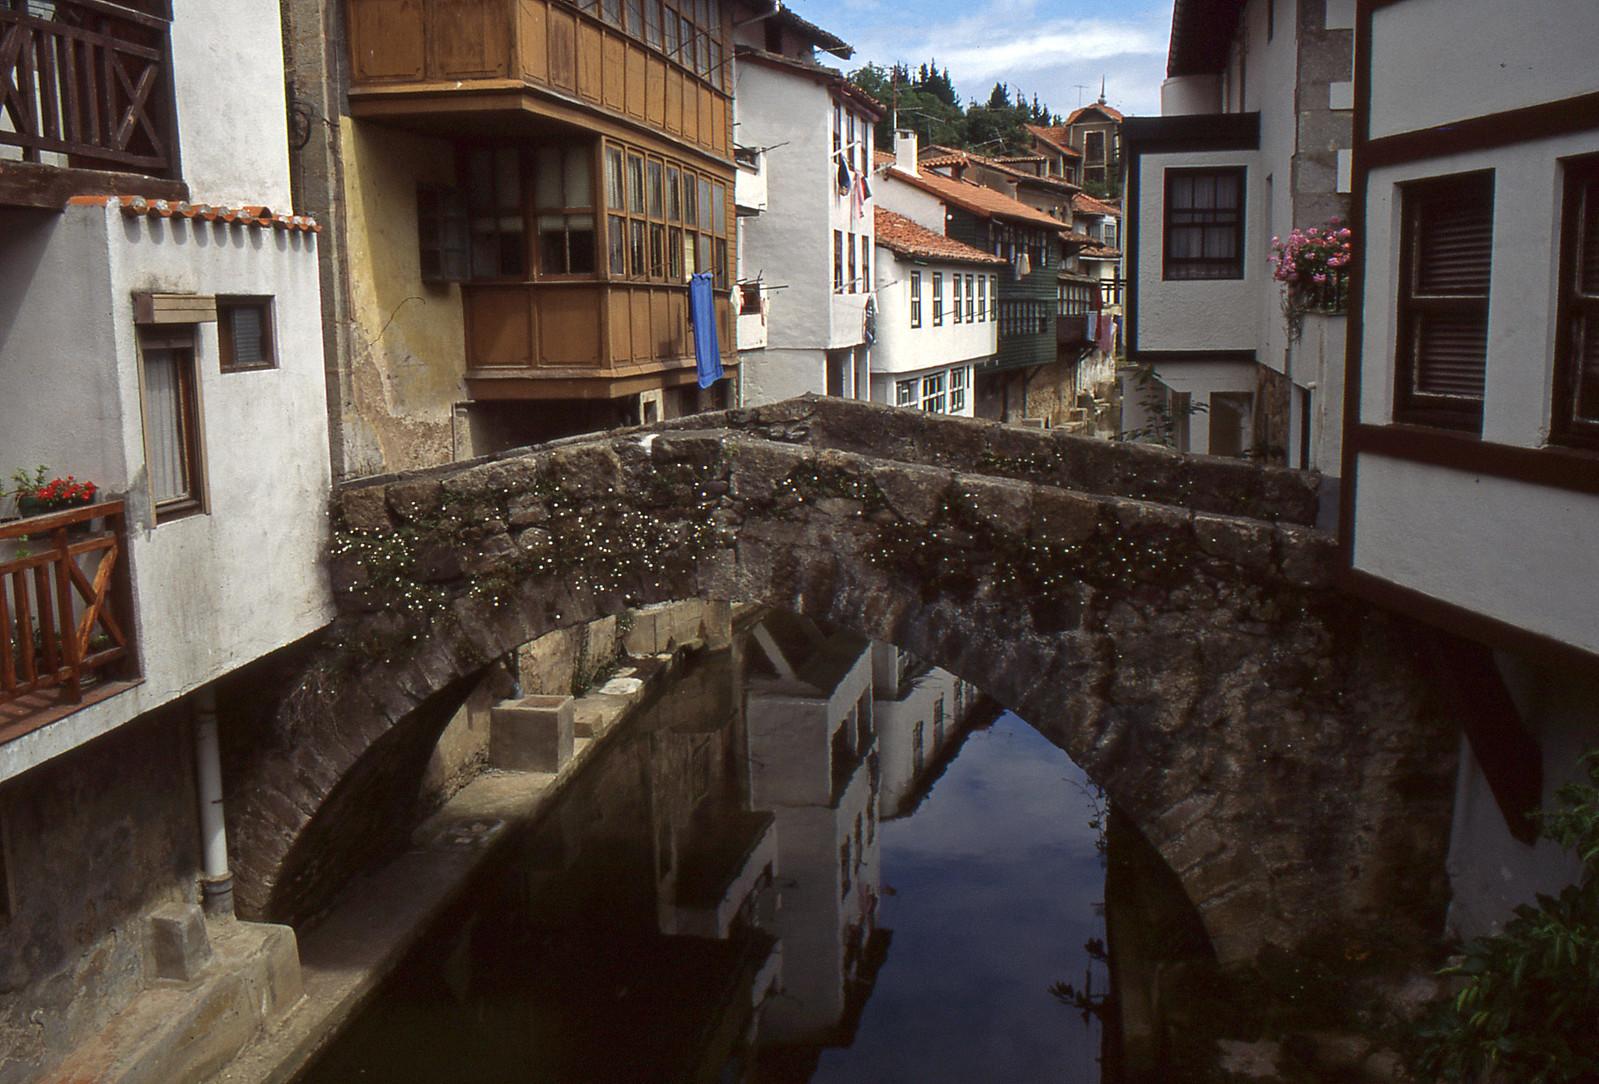 Ea (Euskadi)